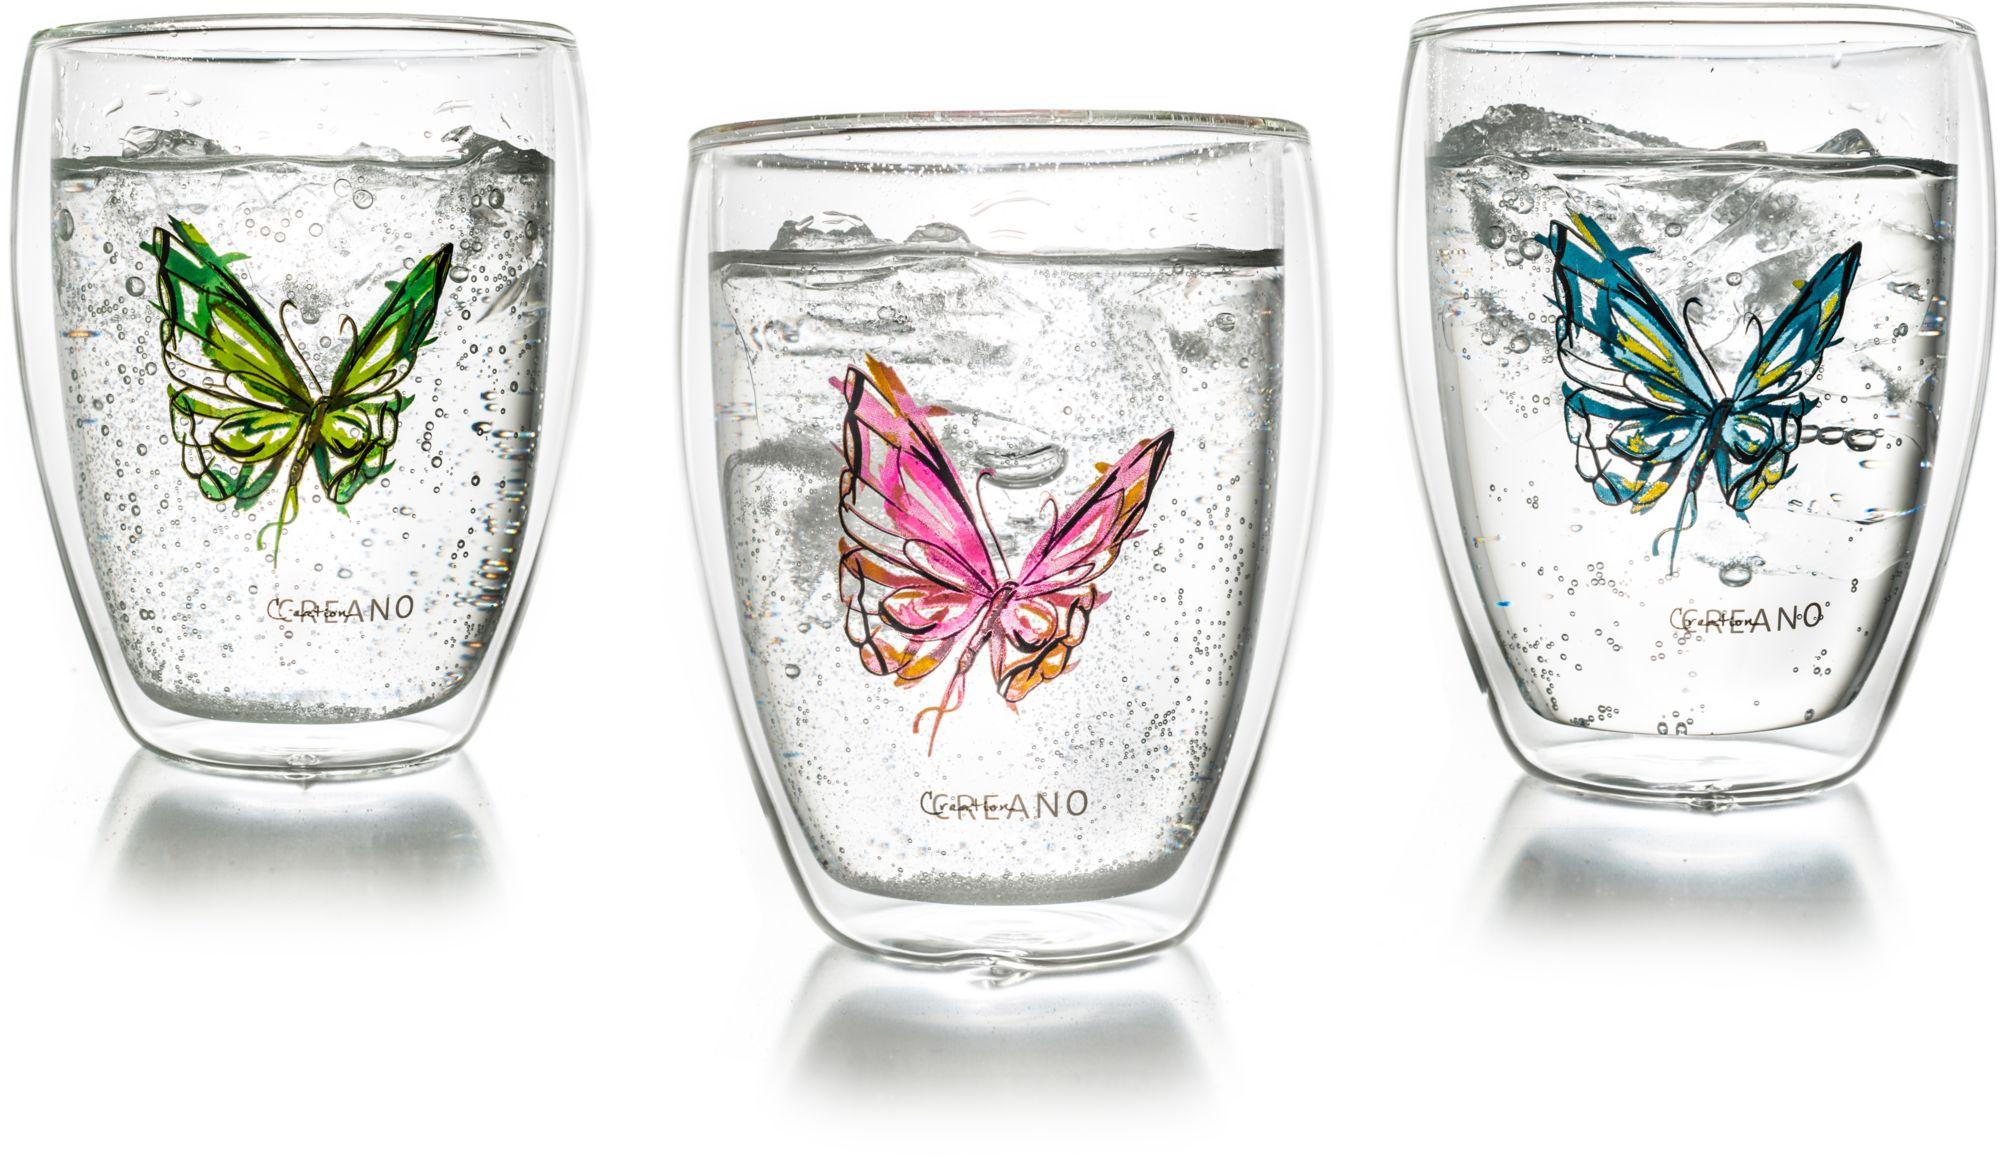 CREANO Creano Thermo-Glas, 3-er Set, doppelwandiges Tee-Glas, Latte Macchiato Glas, »Colourfly«